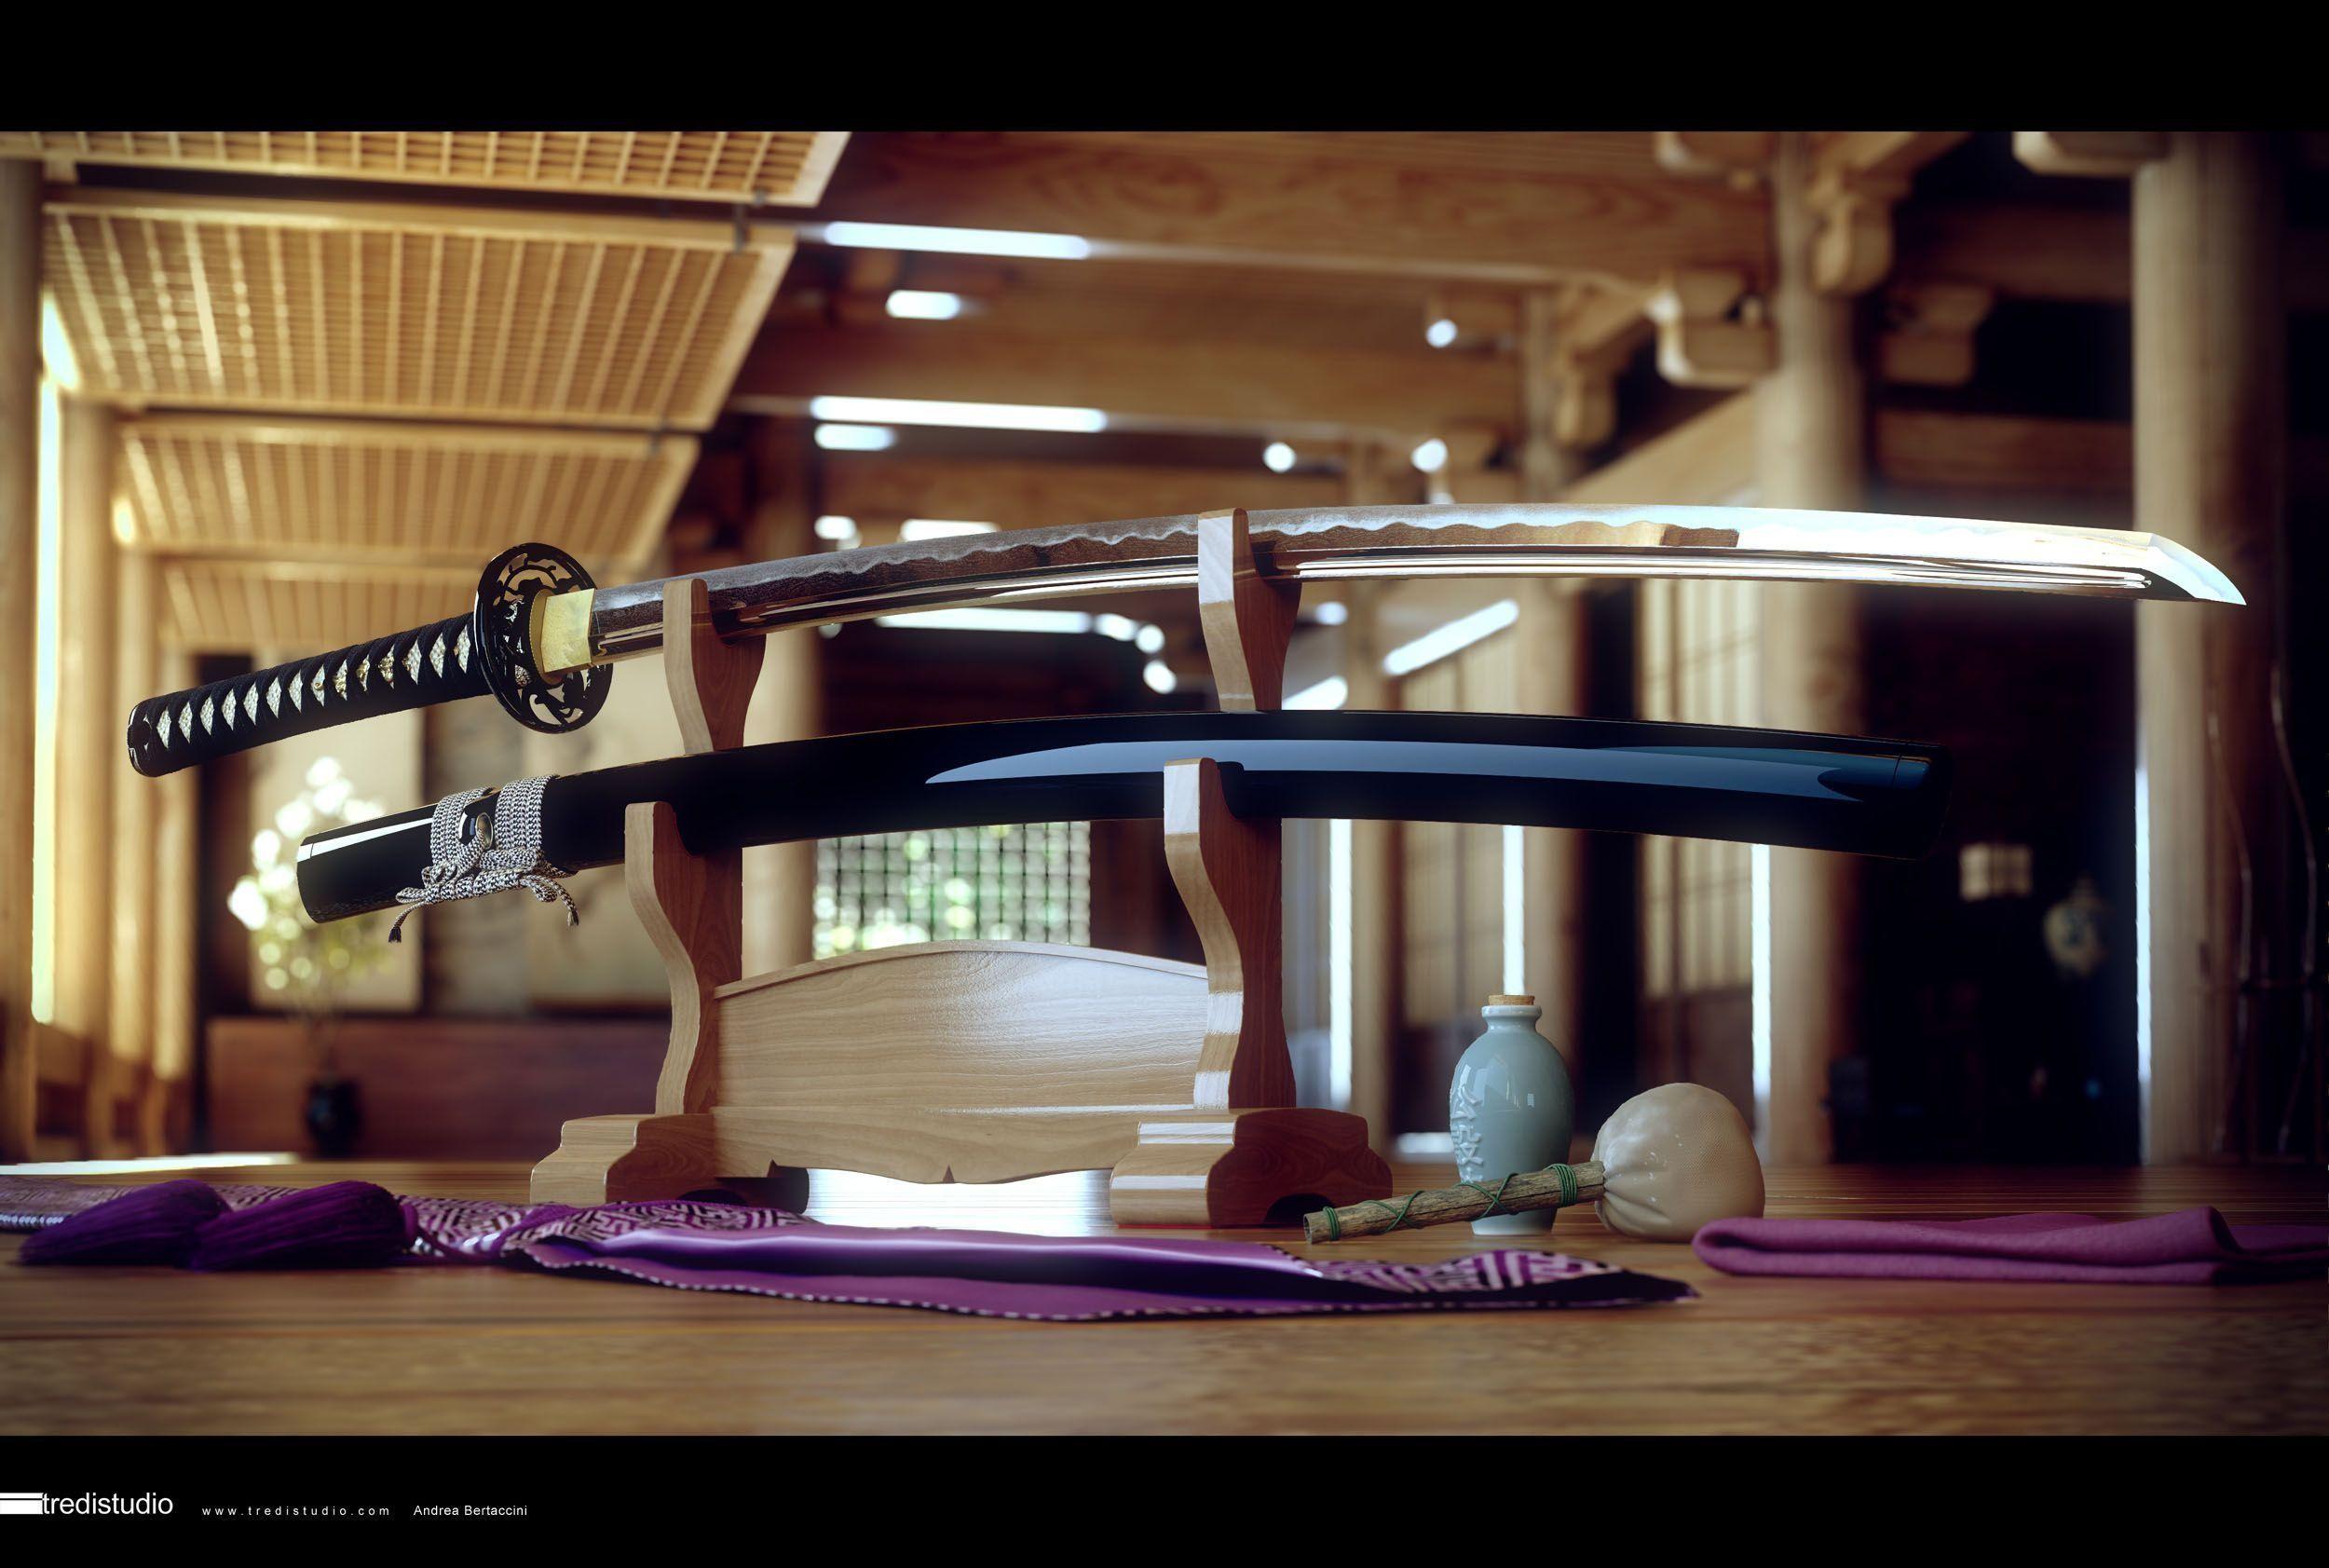 katana-Wallpaper-Japan-Sword – The Samurai Swing